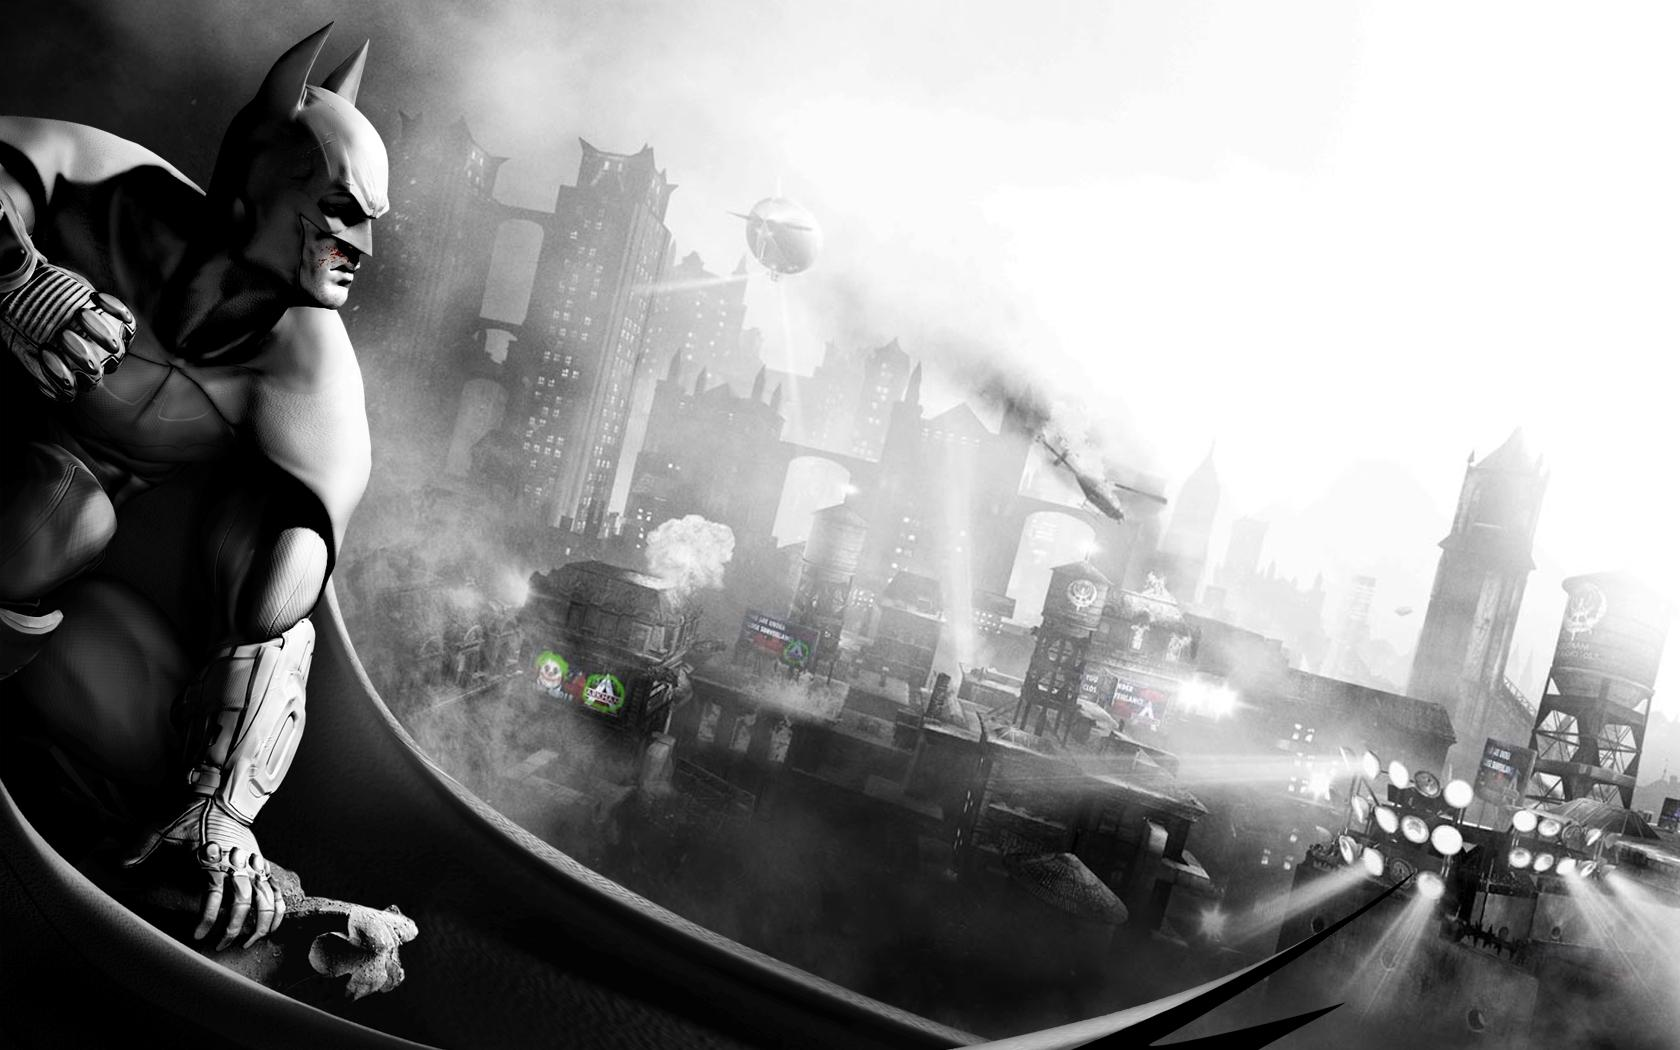 Descargar Batman Arkham City Wallpaper gratis 1680x1050